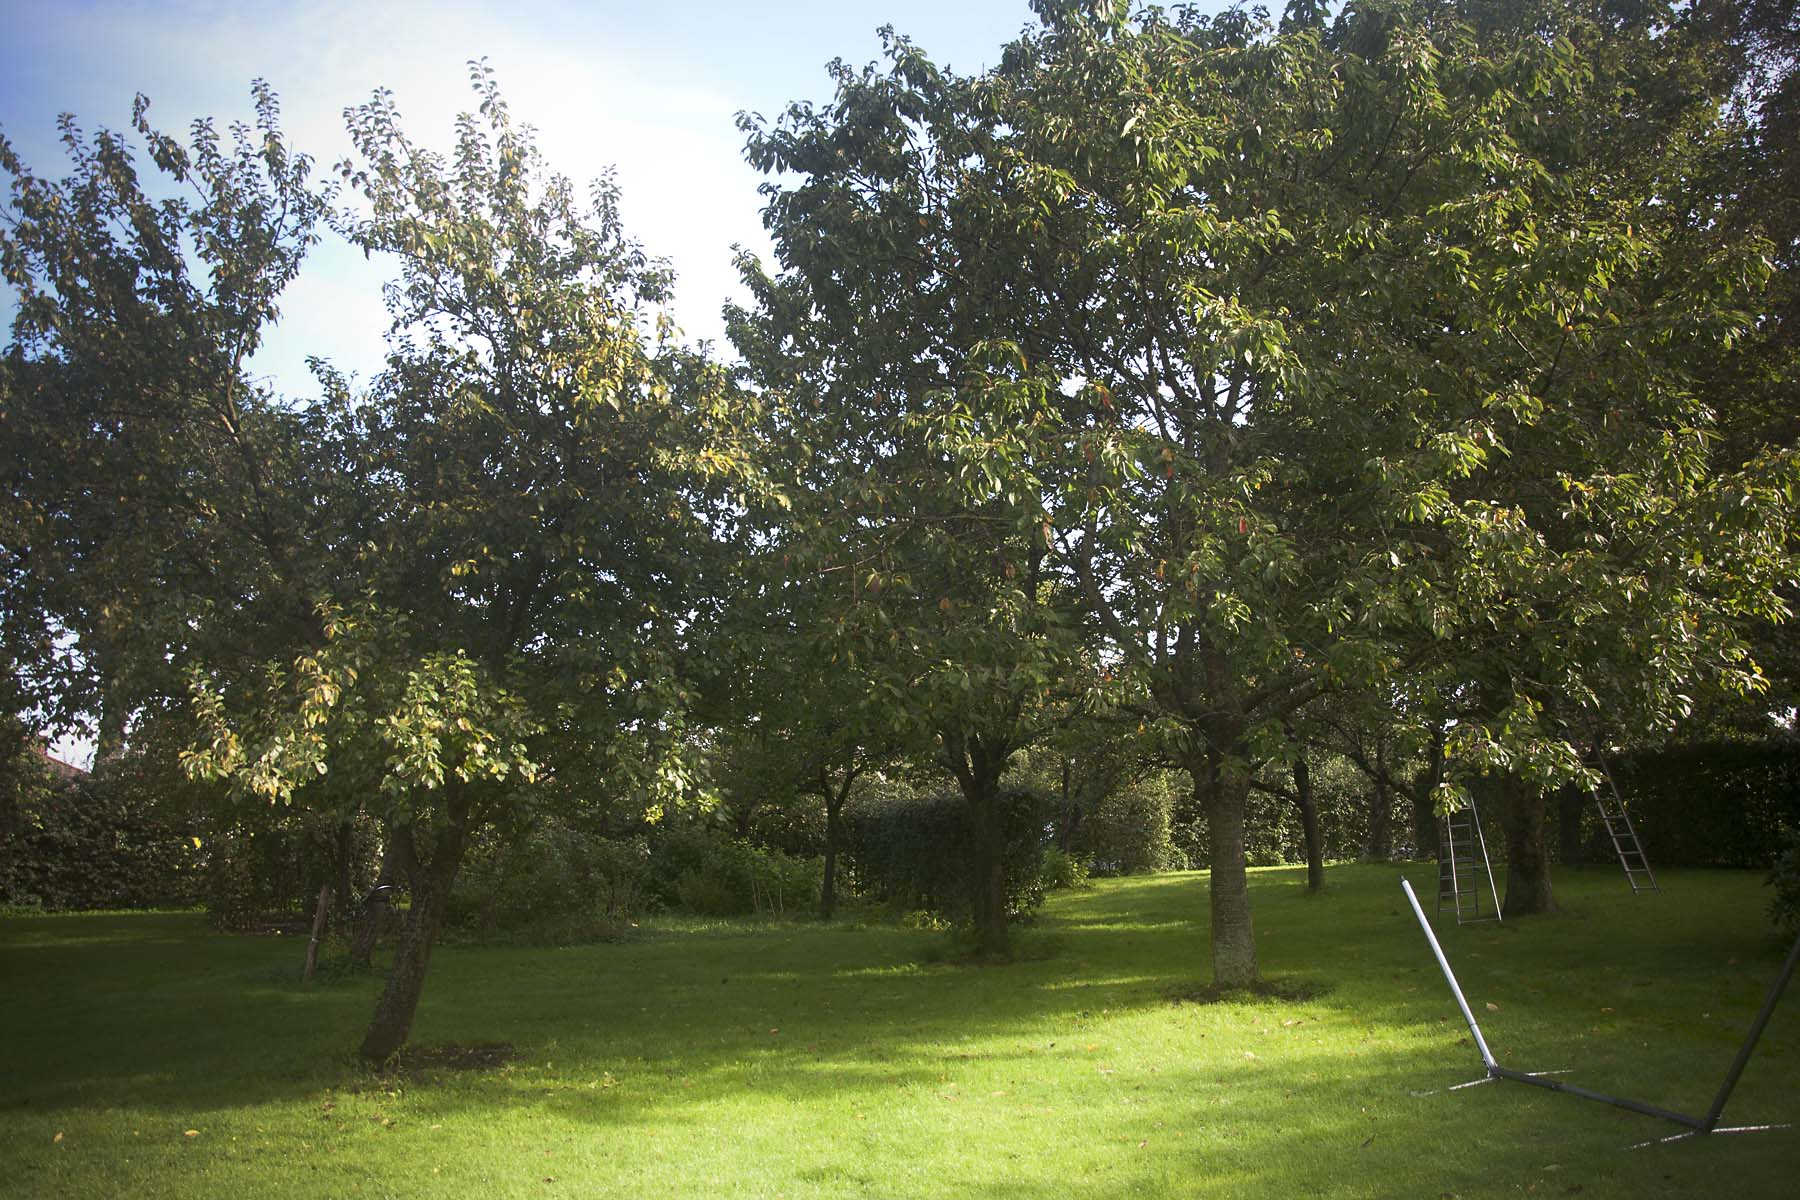 2015 09 19 HSB Steenwijk 5968